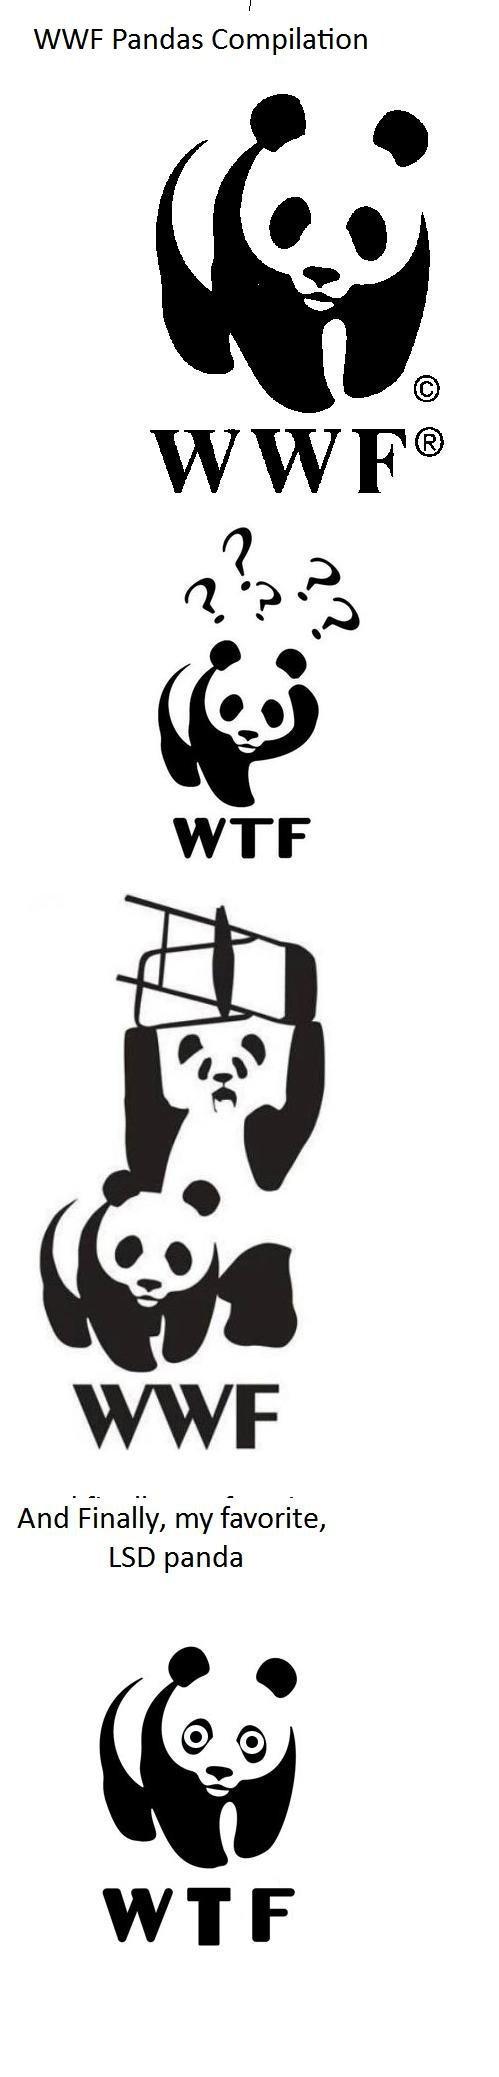 WWF Pandas. . WWF Pandas Compilation LSD panda. yeah WWF Pandas Compilation LSD panda yeah